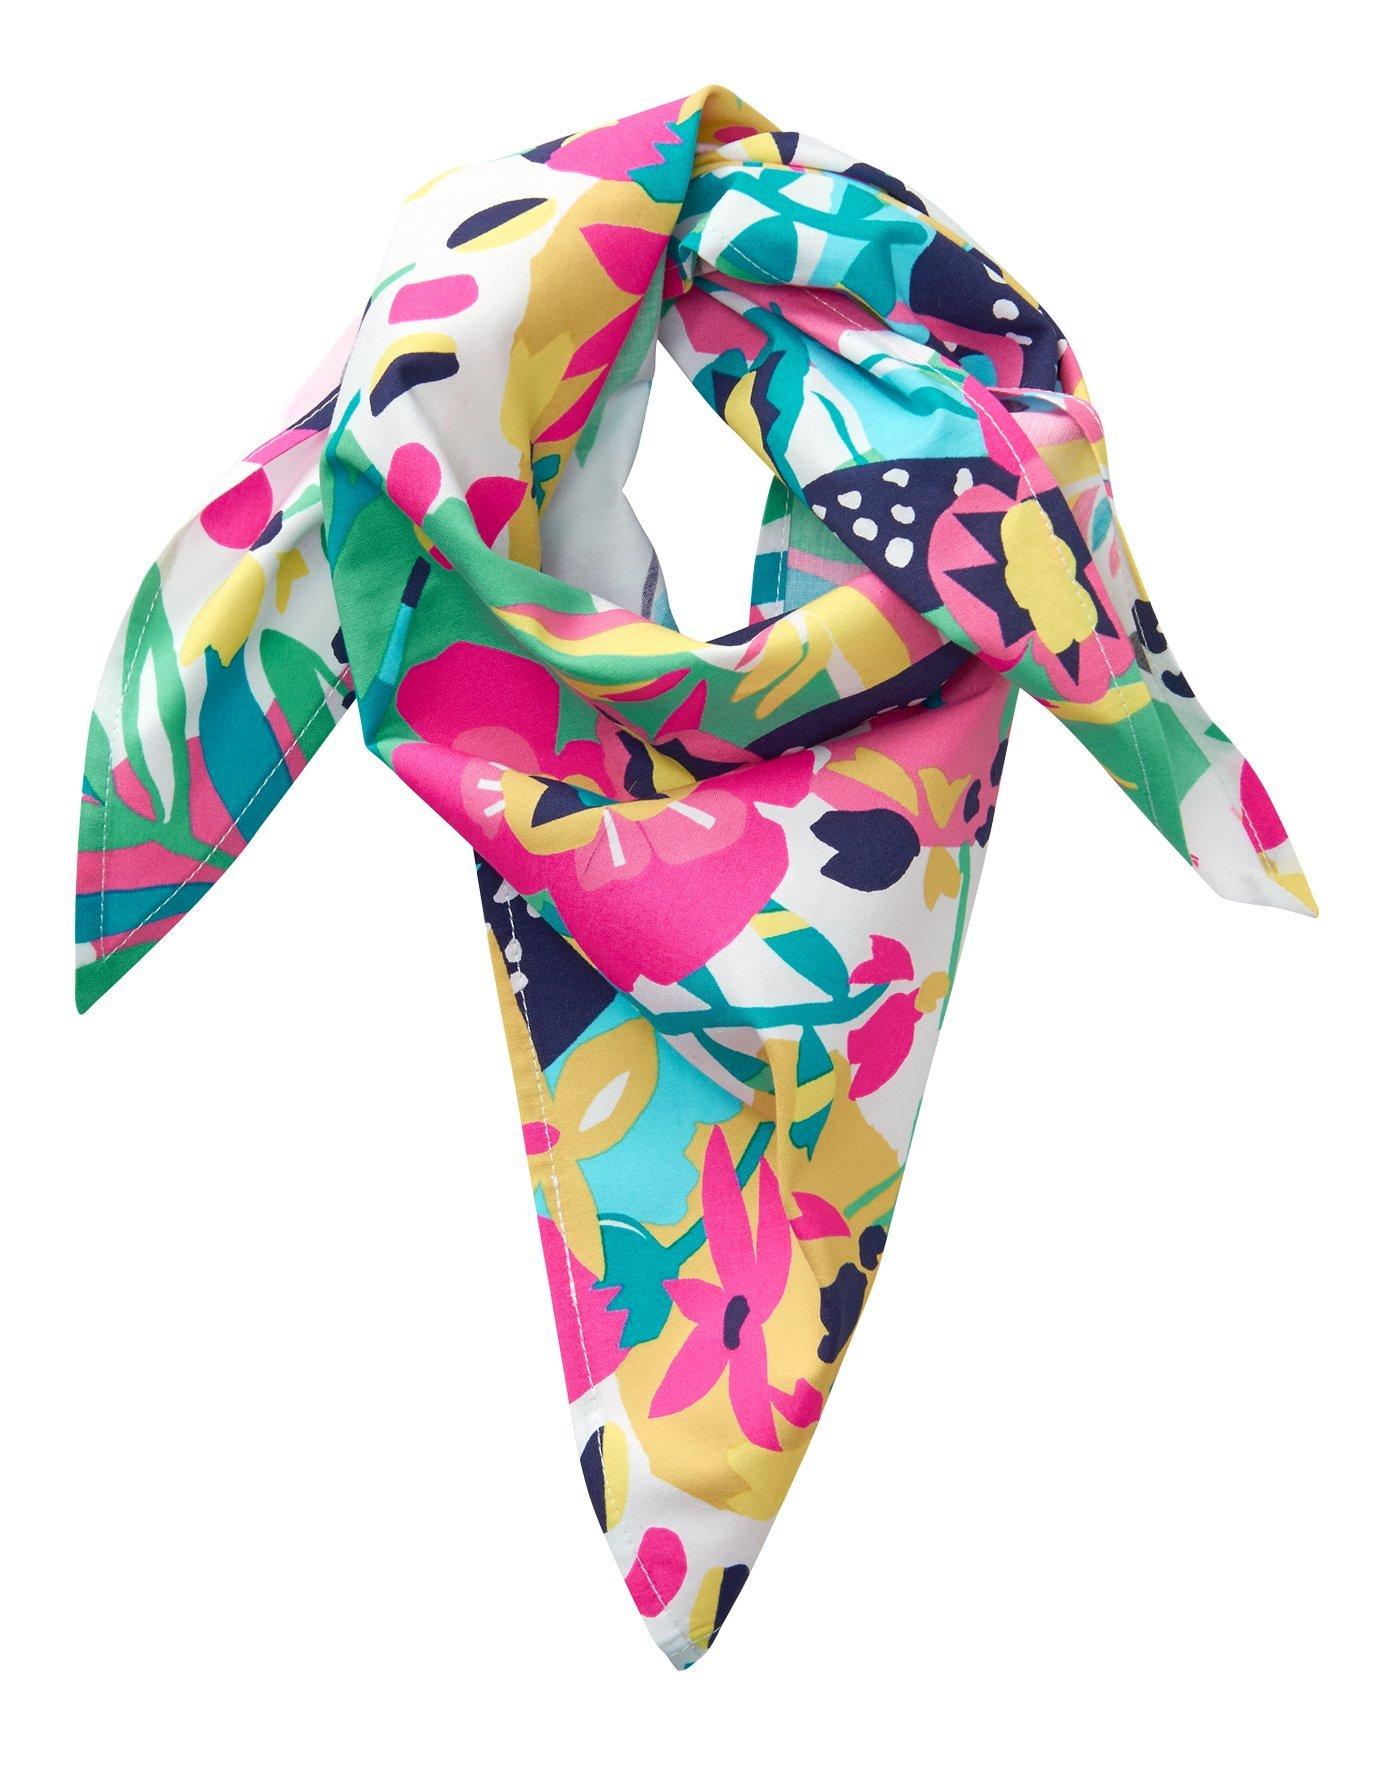 Crazy 8 Little Girls' Printed Neckerchief, Multi Floral, NS